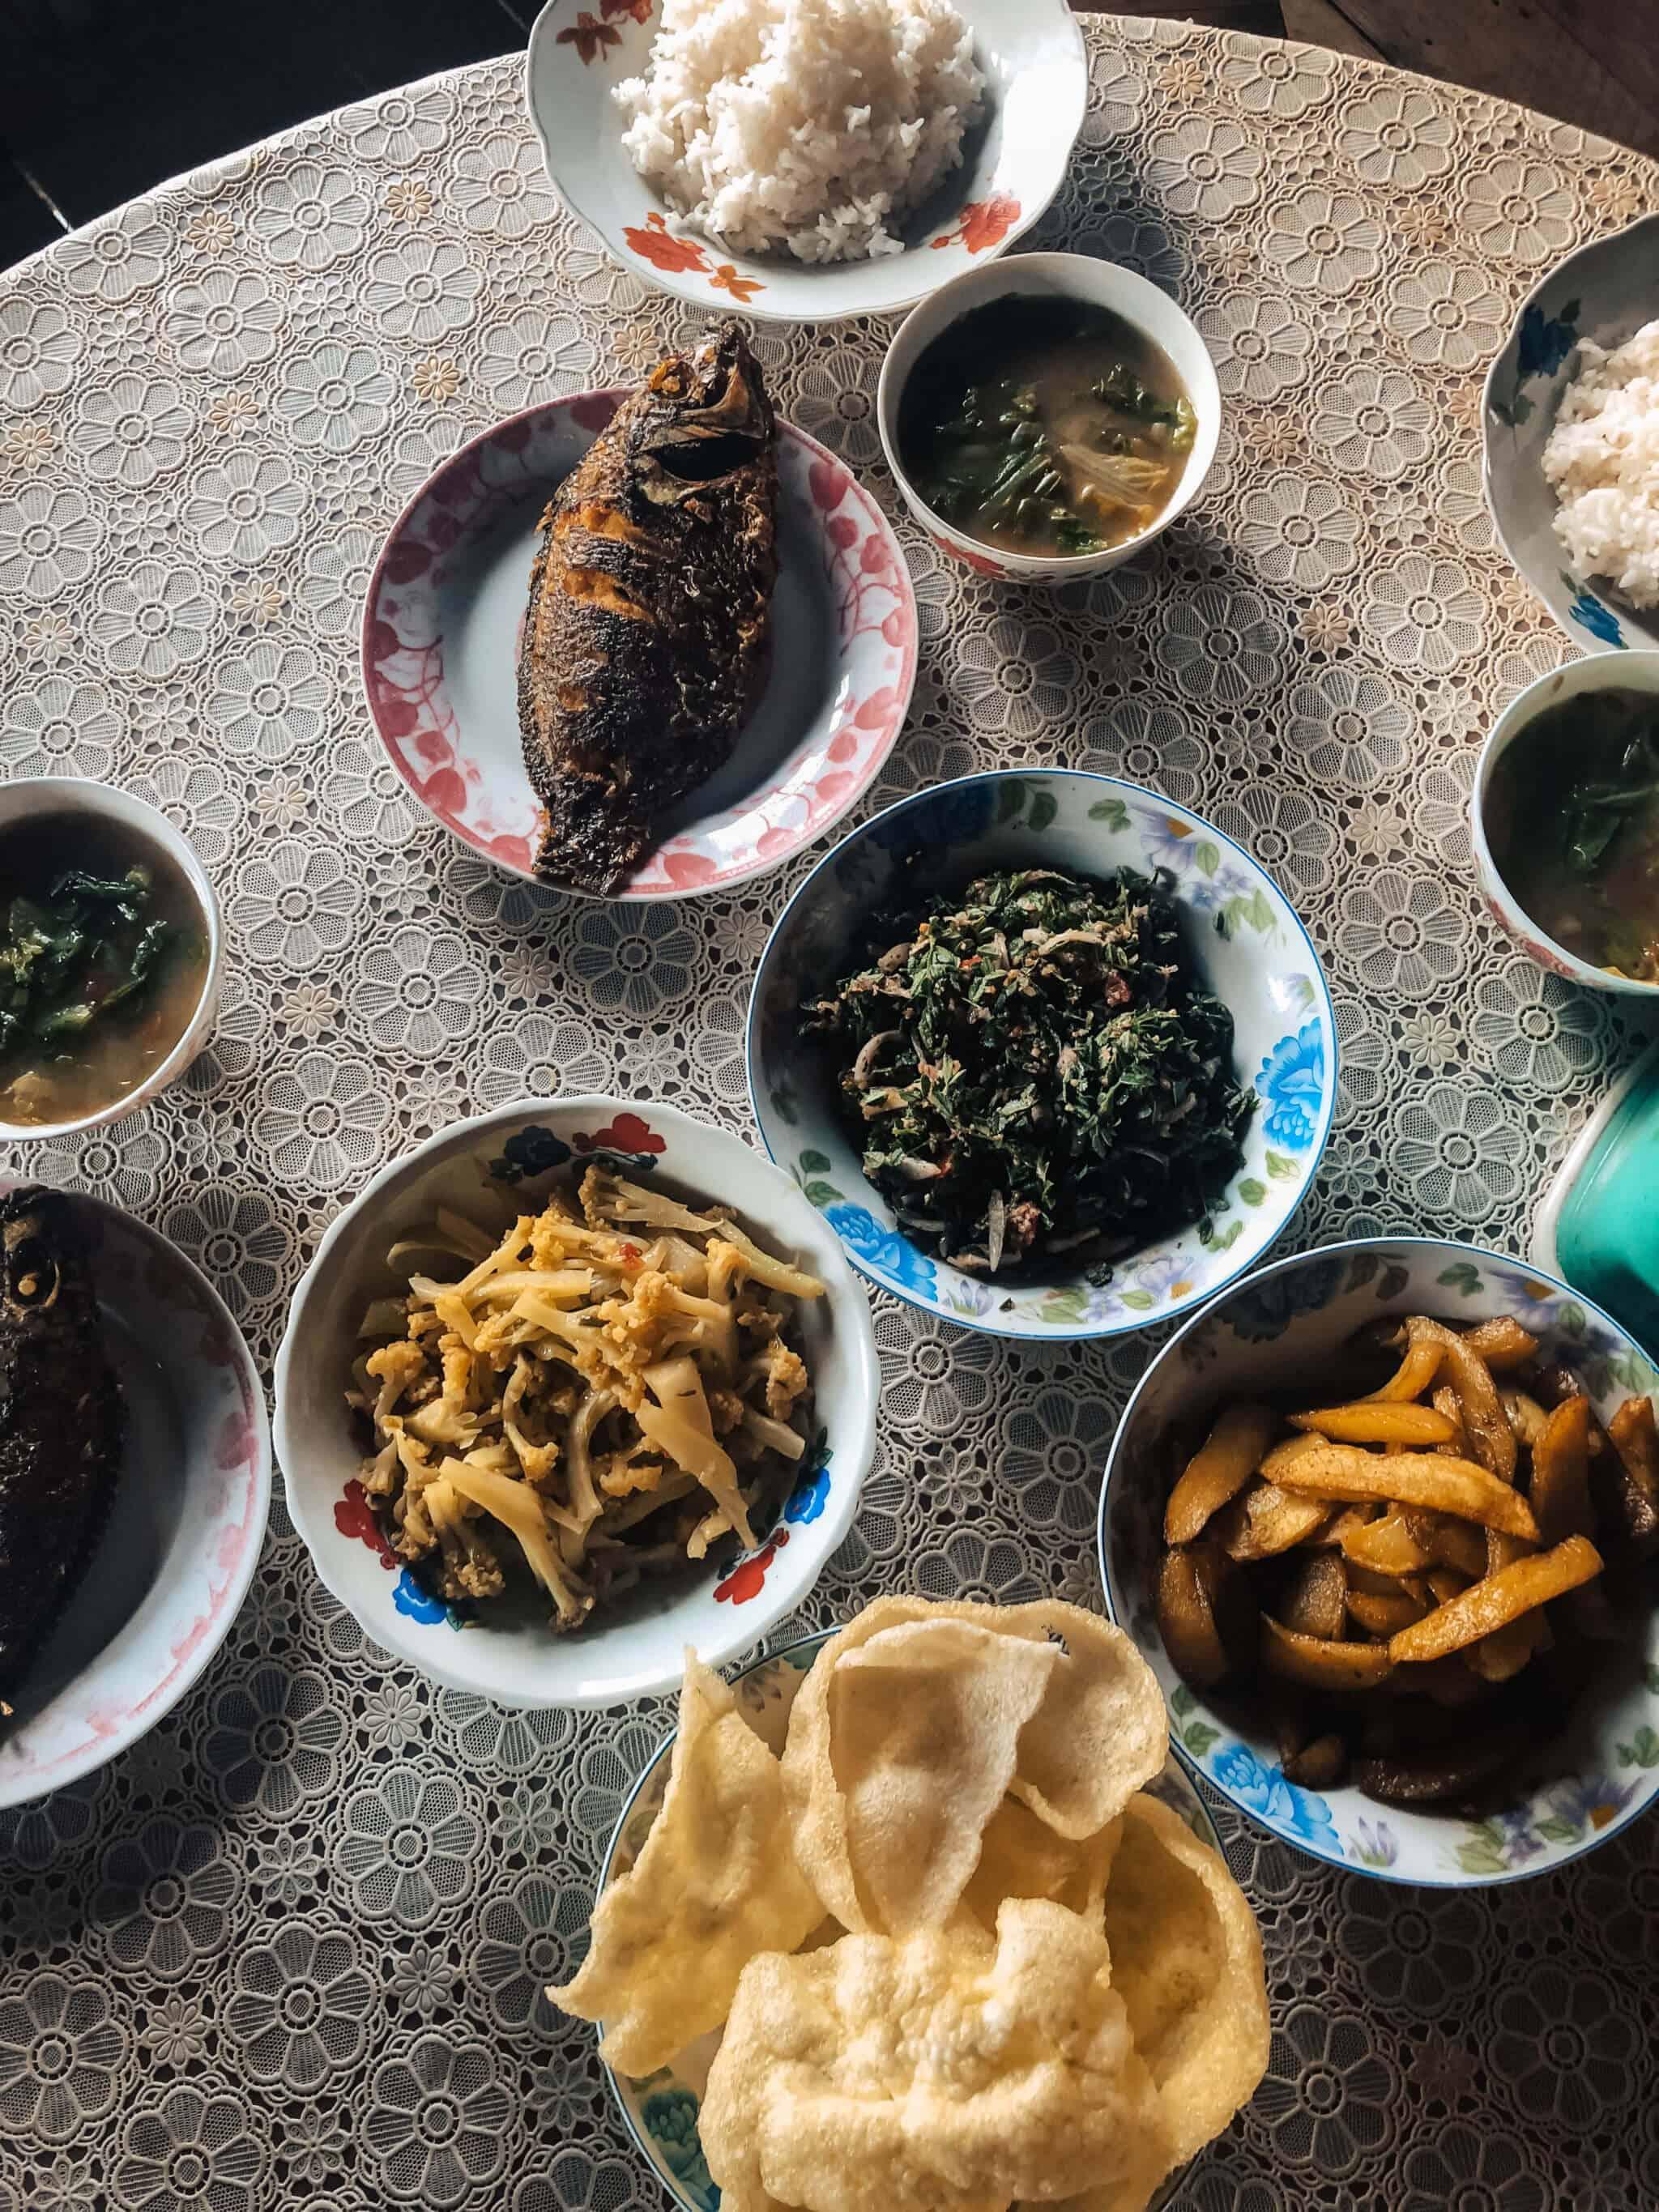 Typical Myanmar food